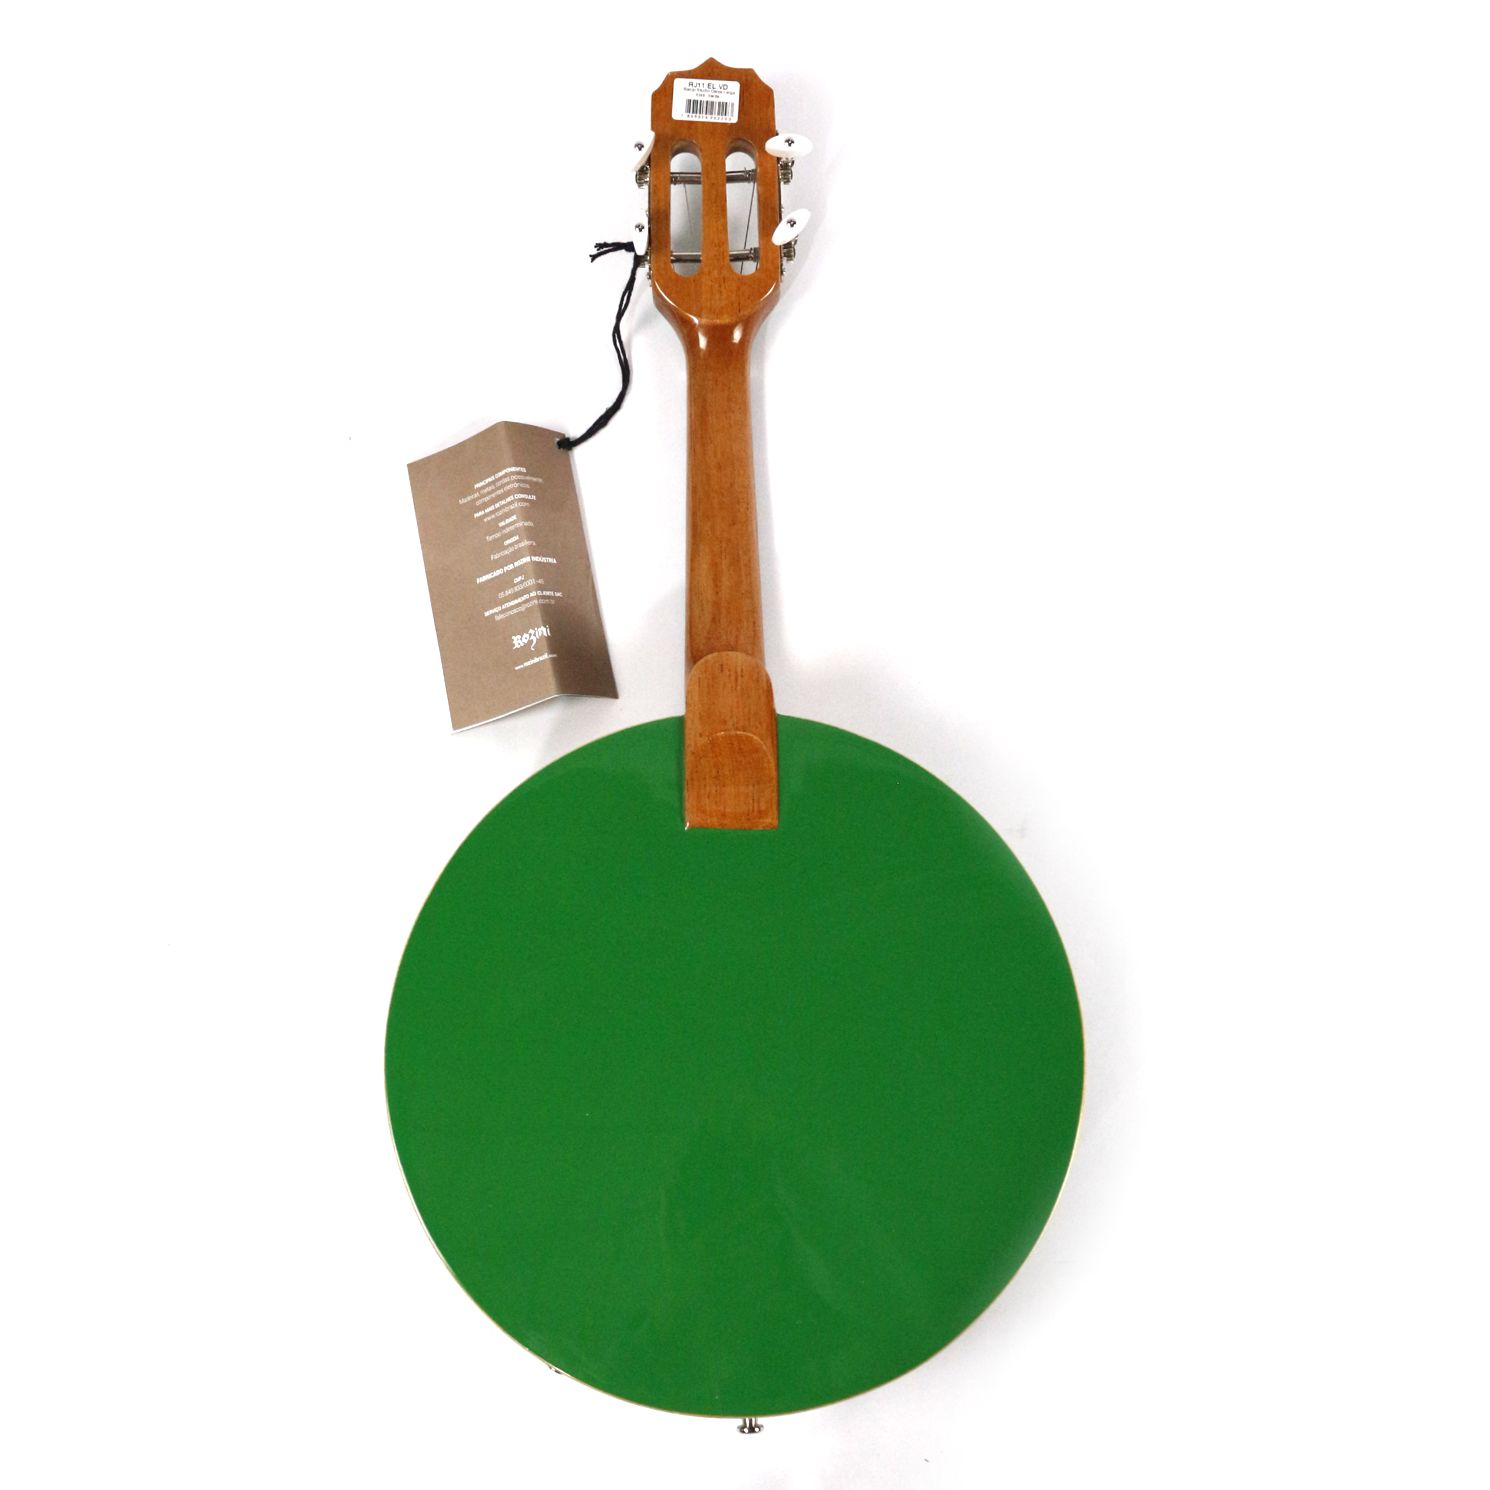 Banjo Rozini Studio Verde Brilhante Elétrico RJ11ELV